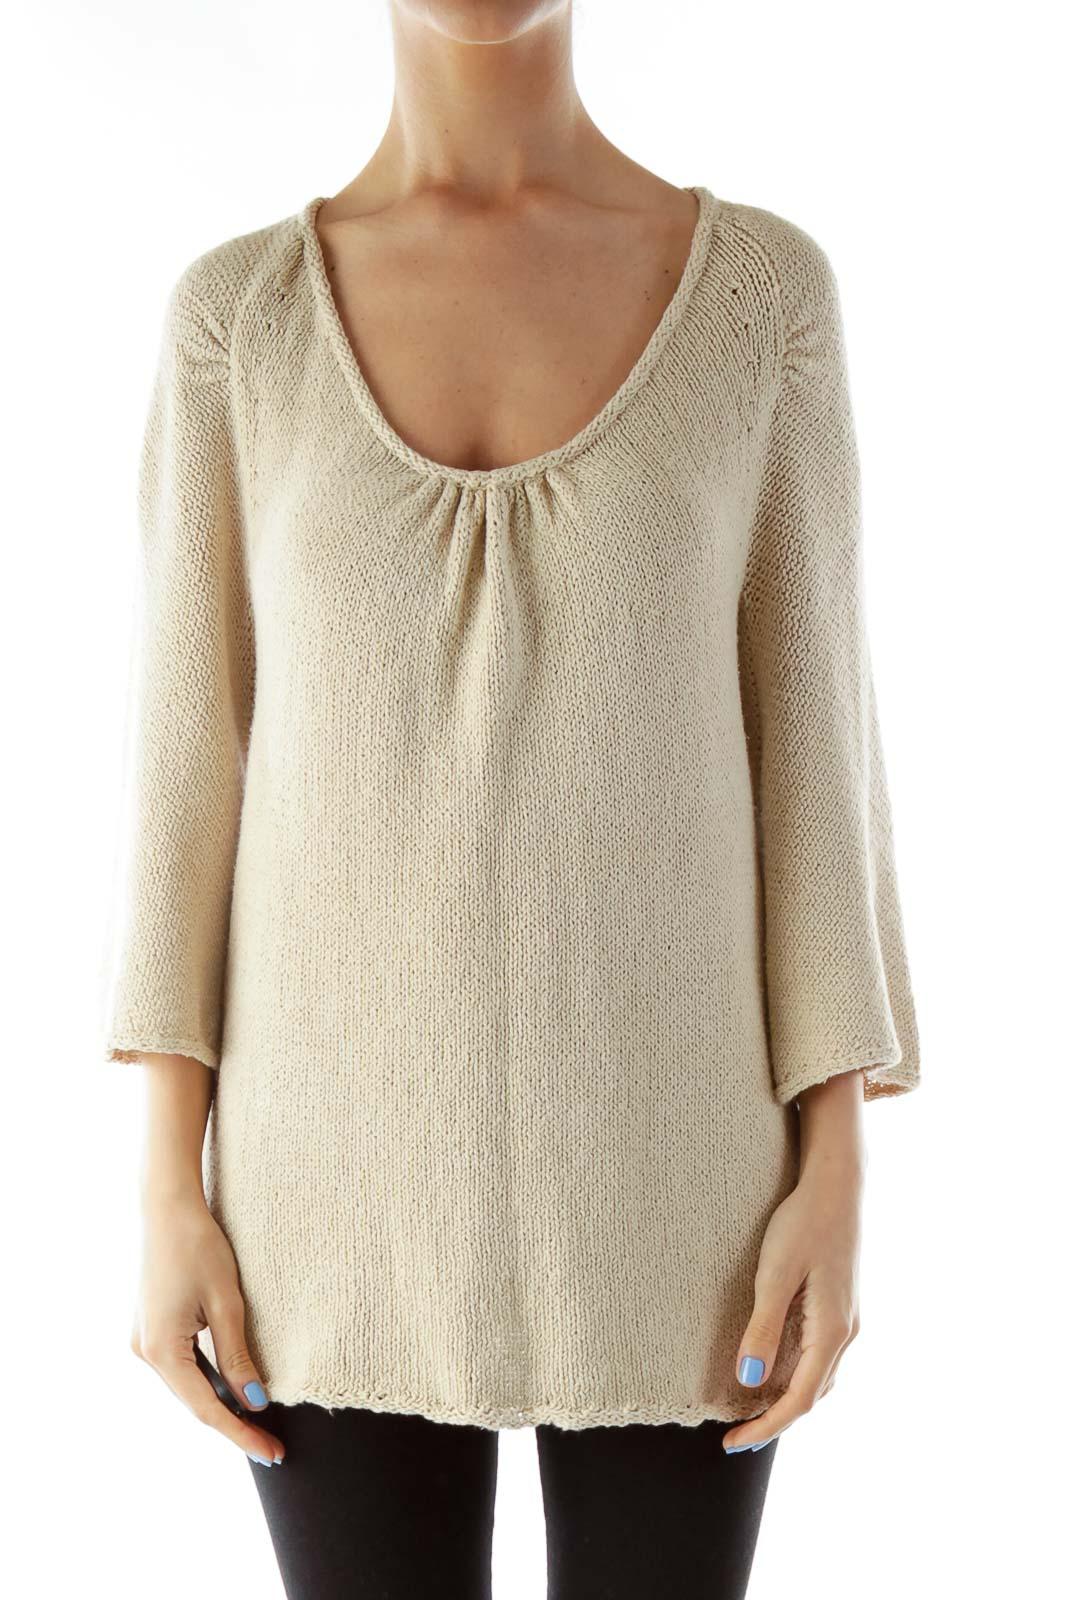 Beige Knit Sweater Front